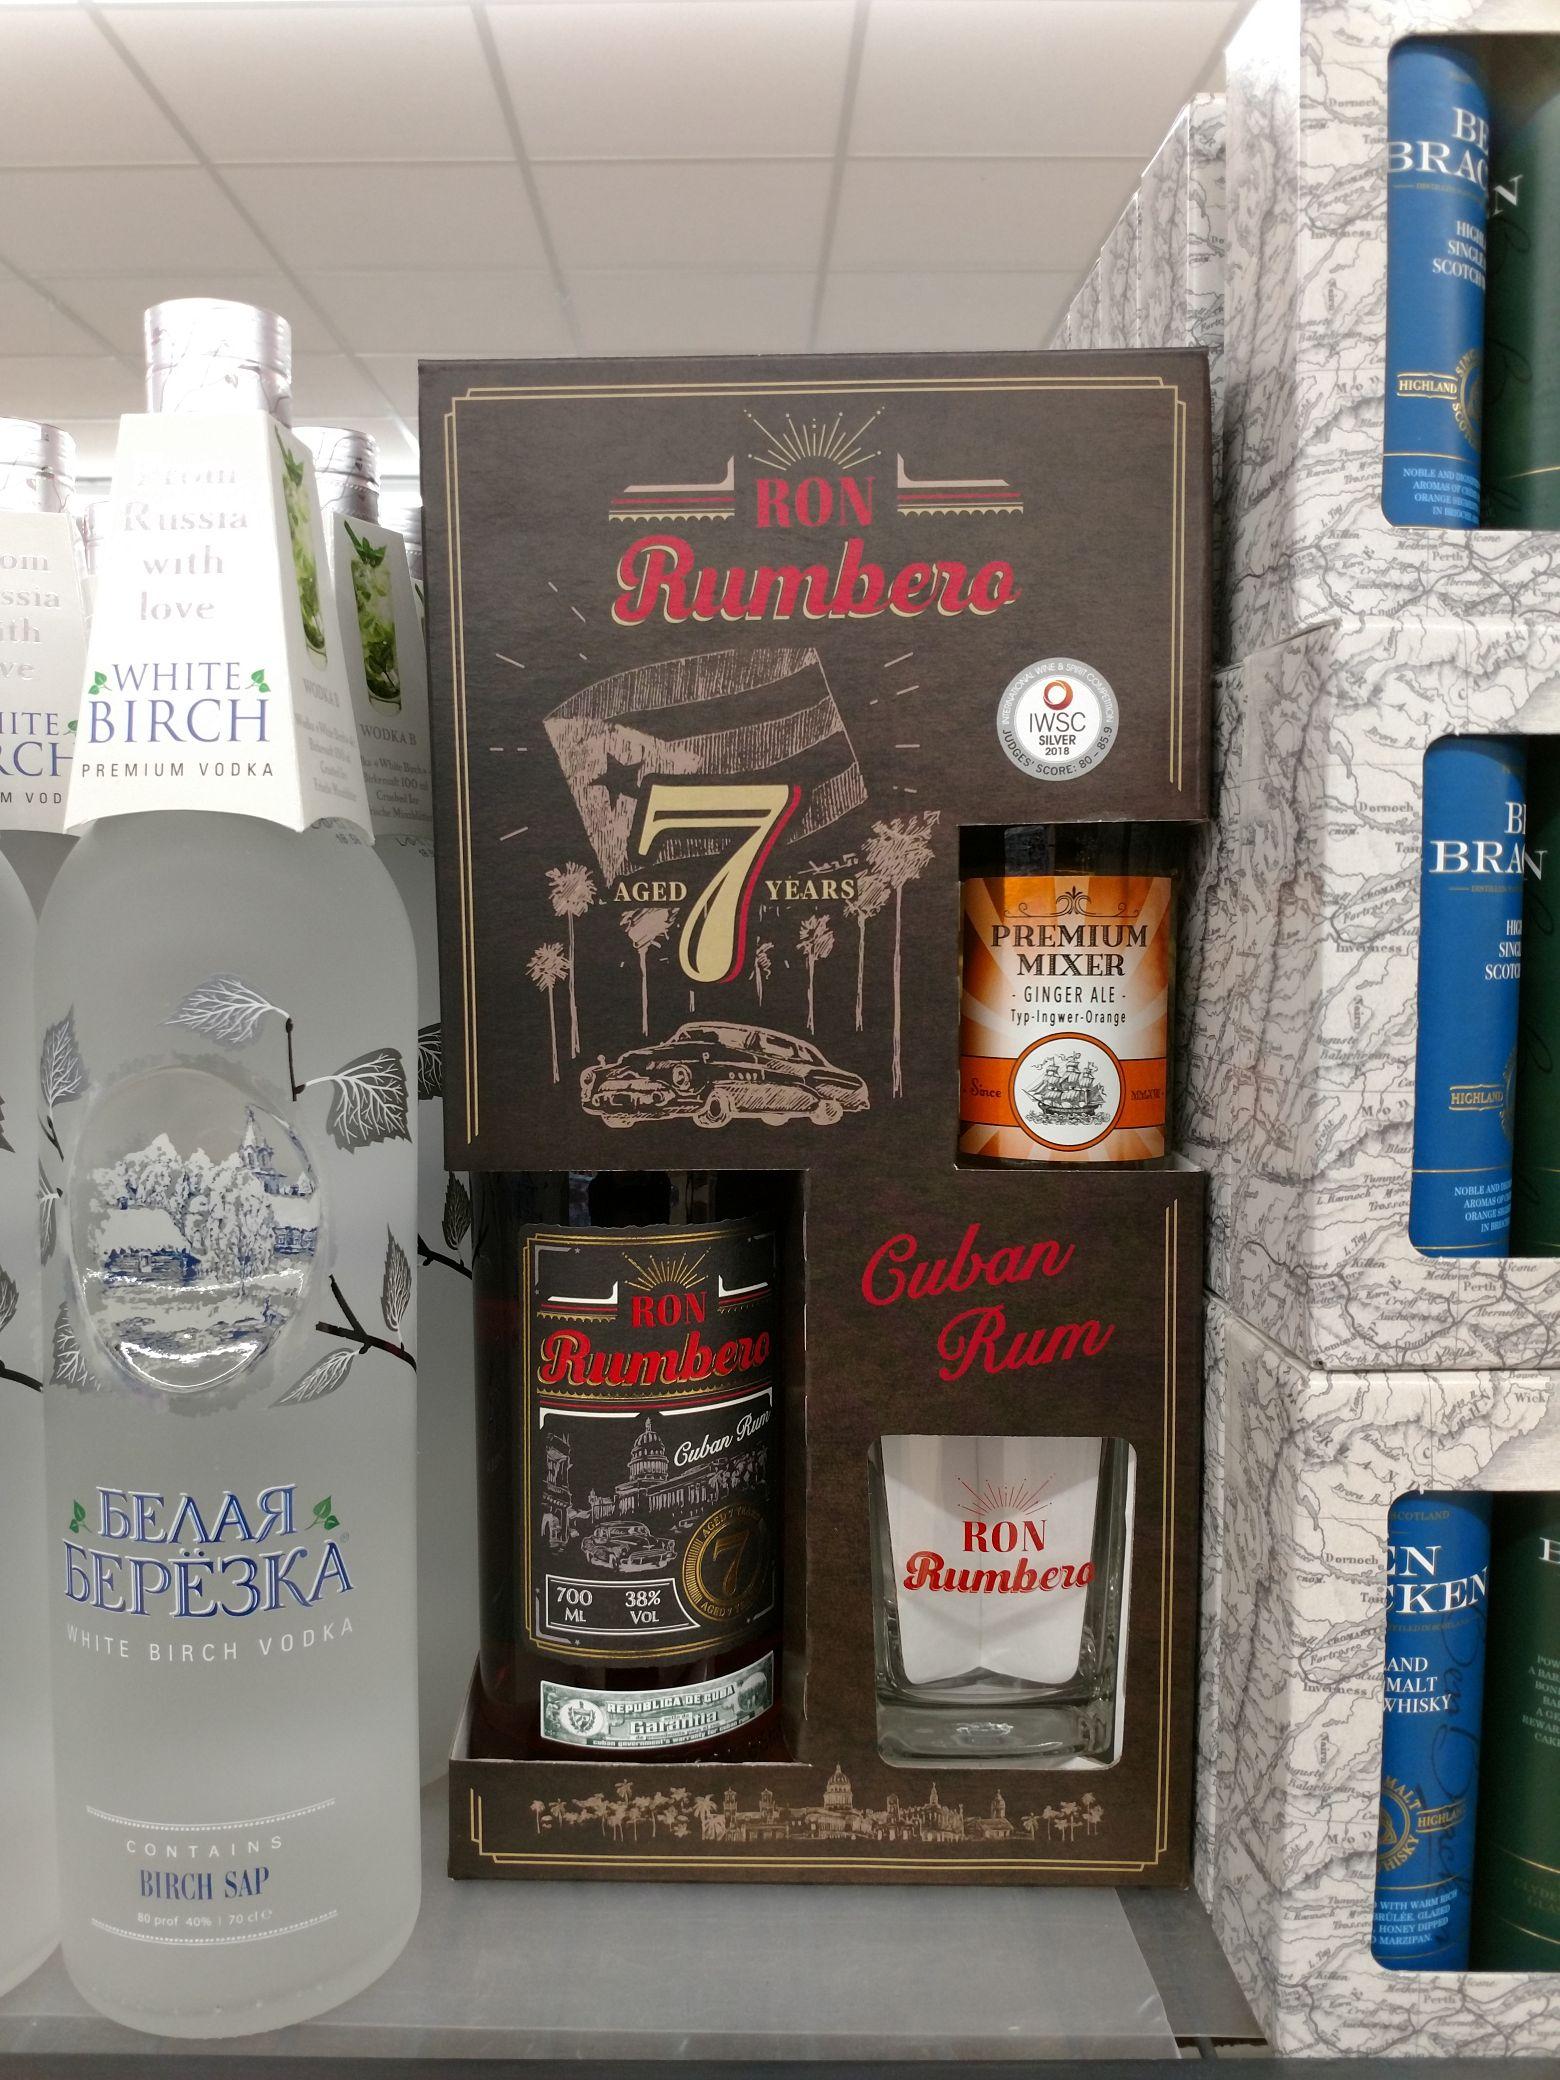 Ron Rumbero 7 Jahre (Rum aus Kuba) + Tumbler + Ginger Ale. / Lidl